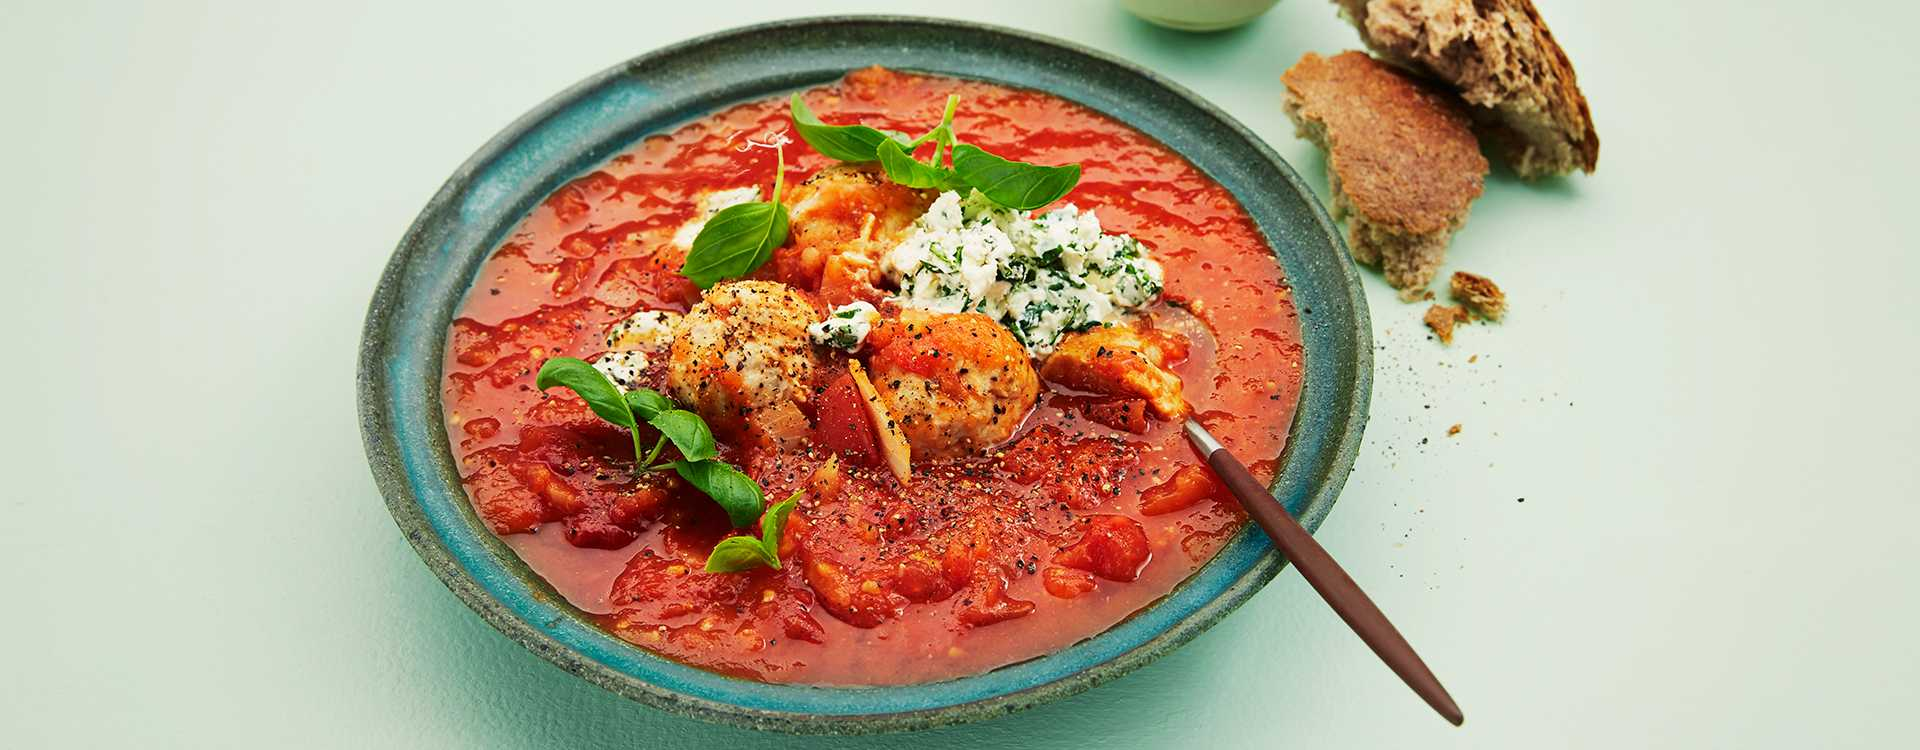 Frisk tomatsuppe